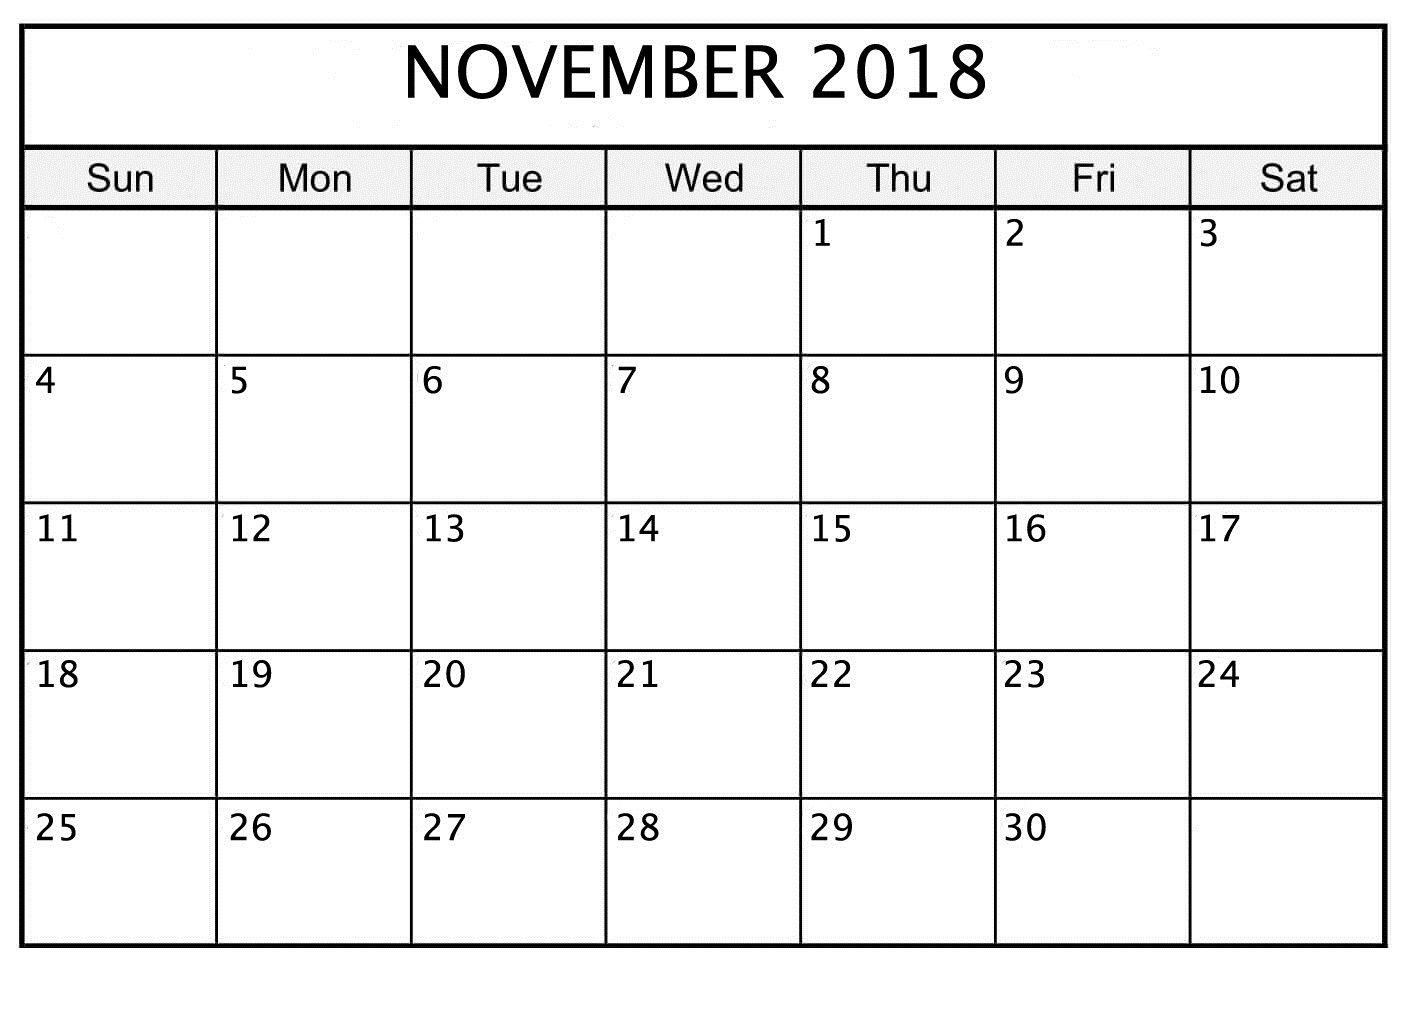 November 2018 Printable Calendar Date And Time   November